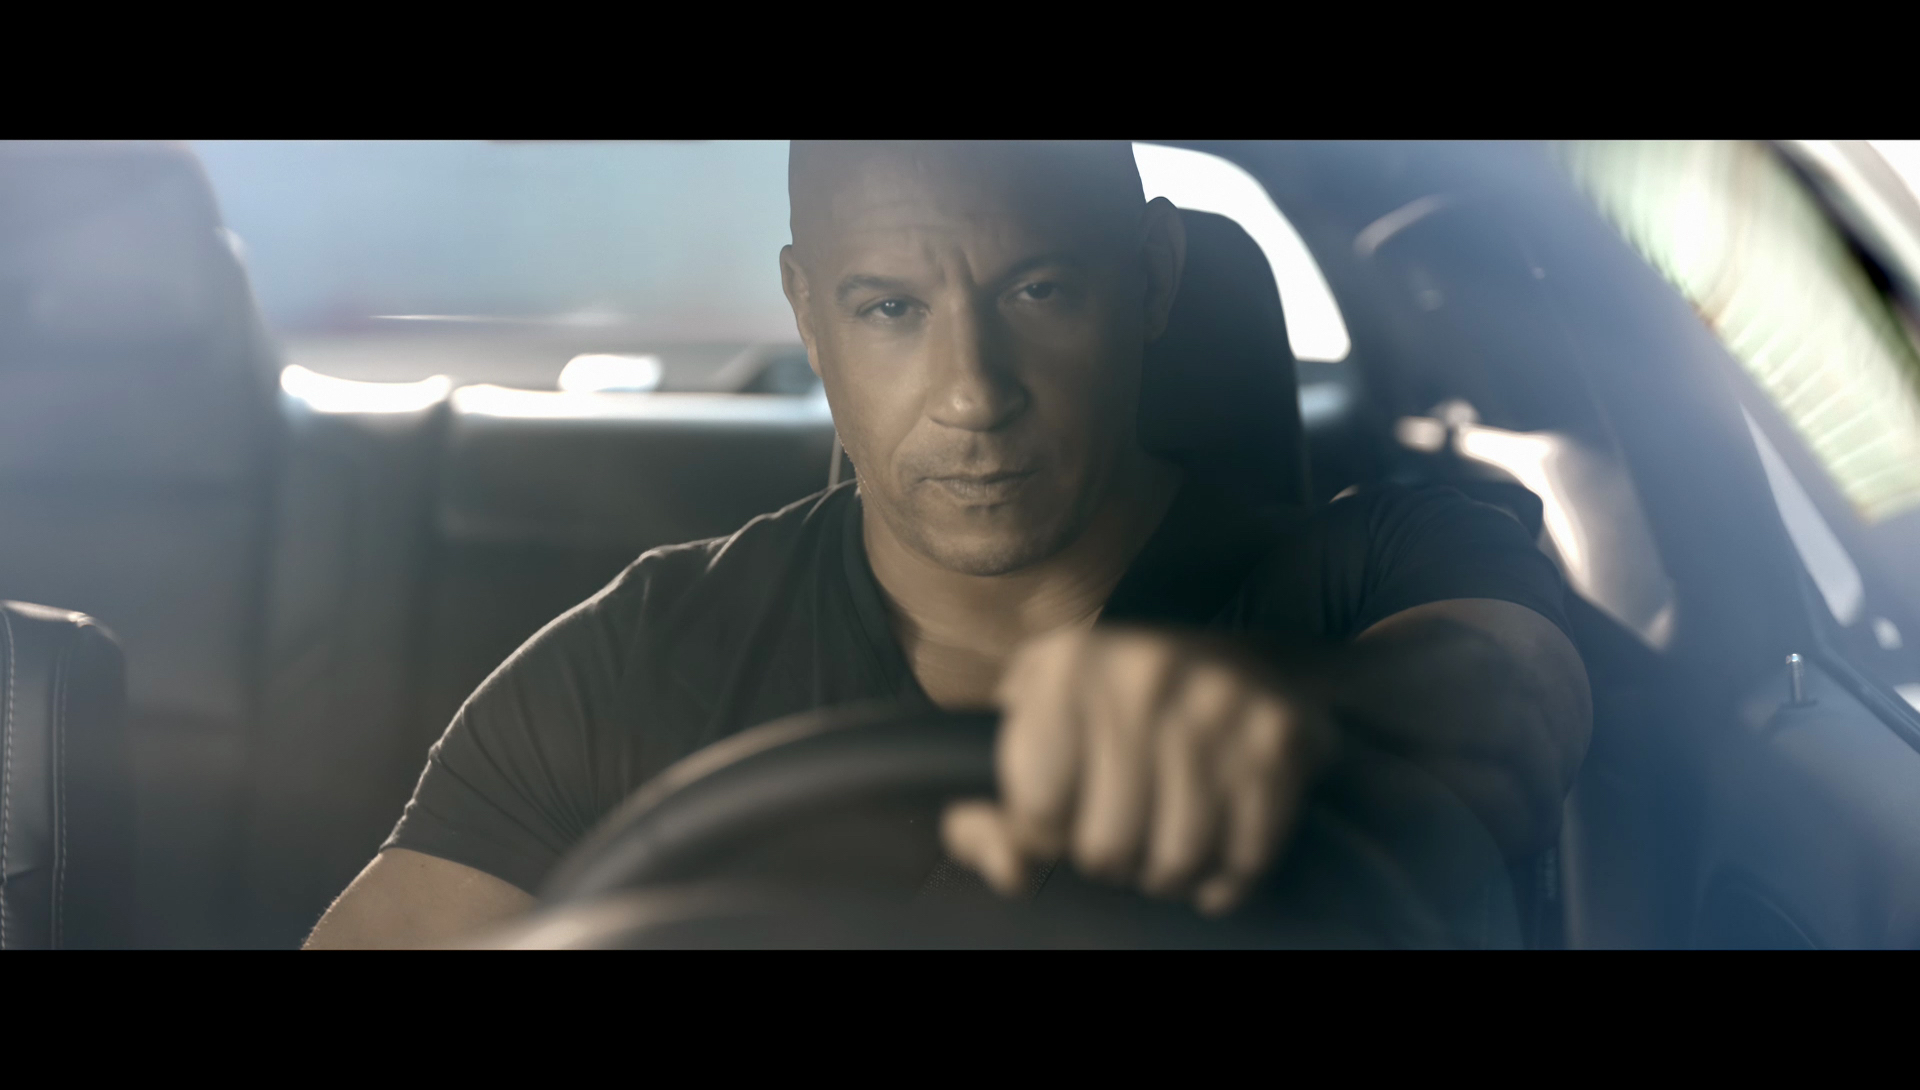 vin diesel joins dodge  brotherhood  muscle ad campaign